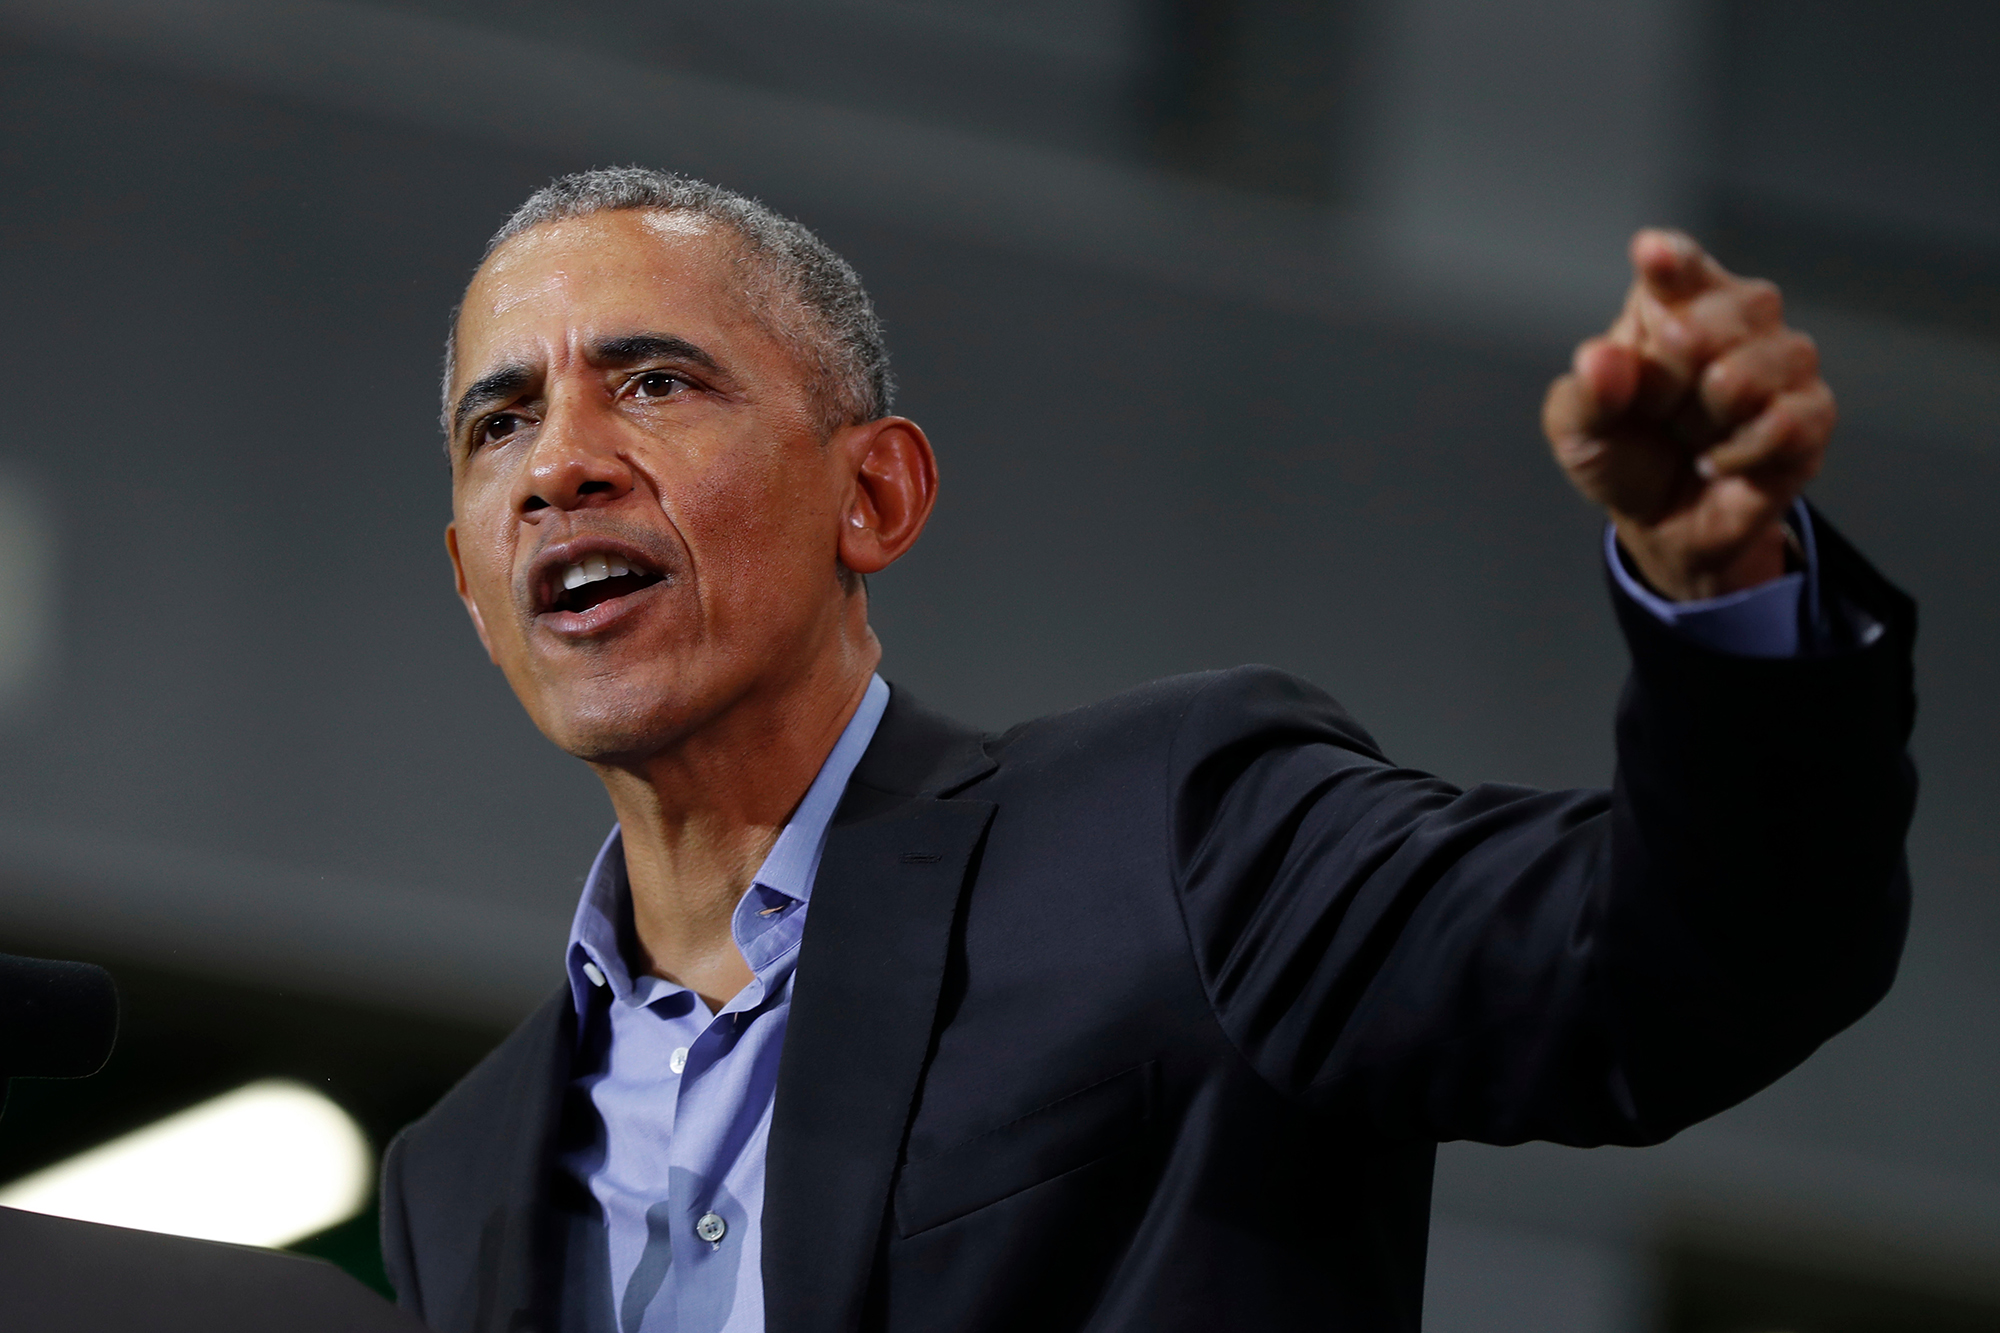 Truth trump obama mocking disabled people